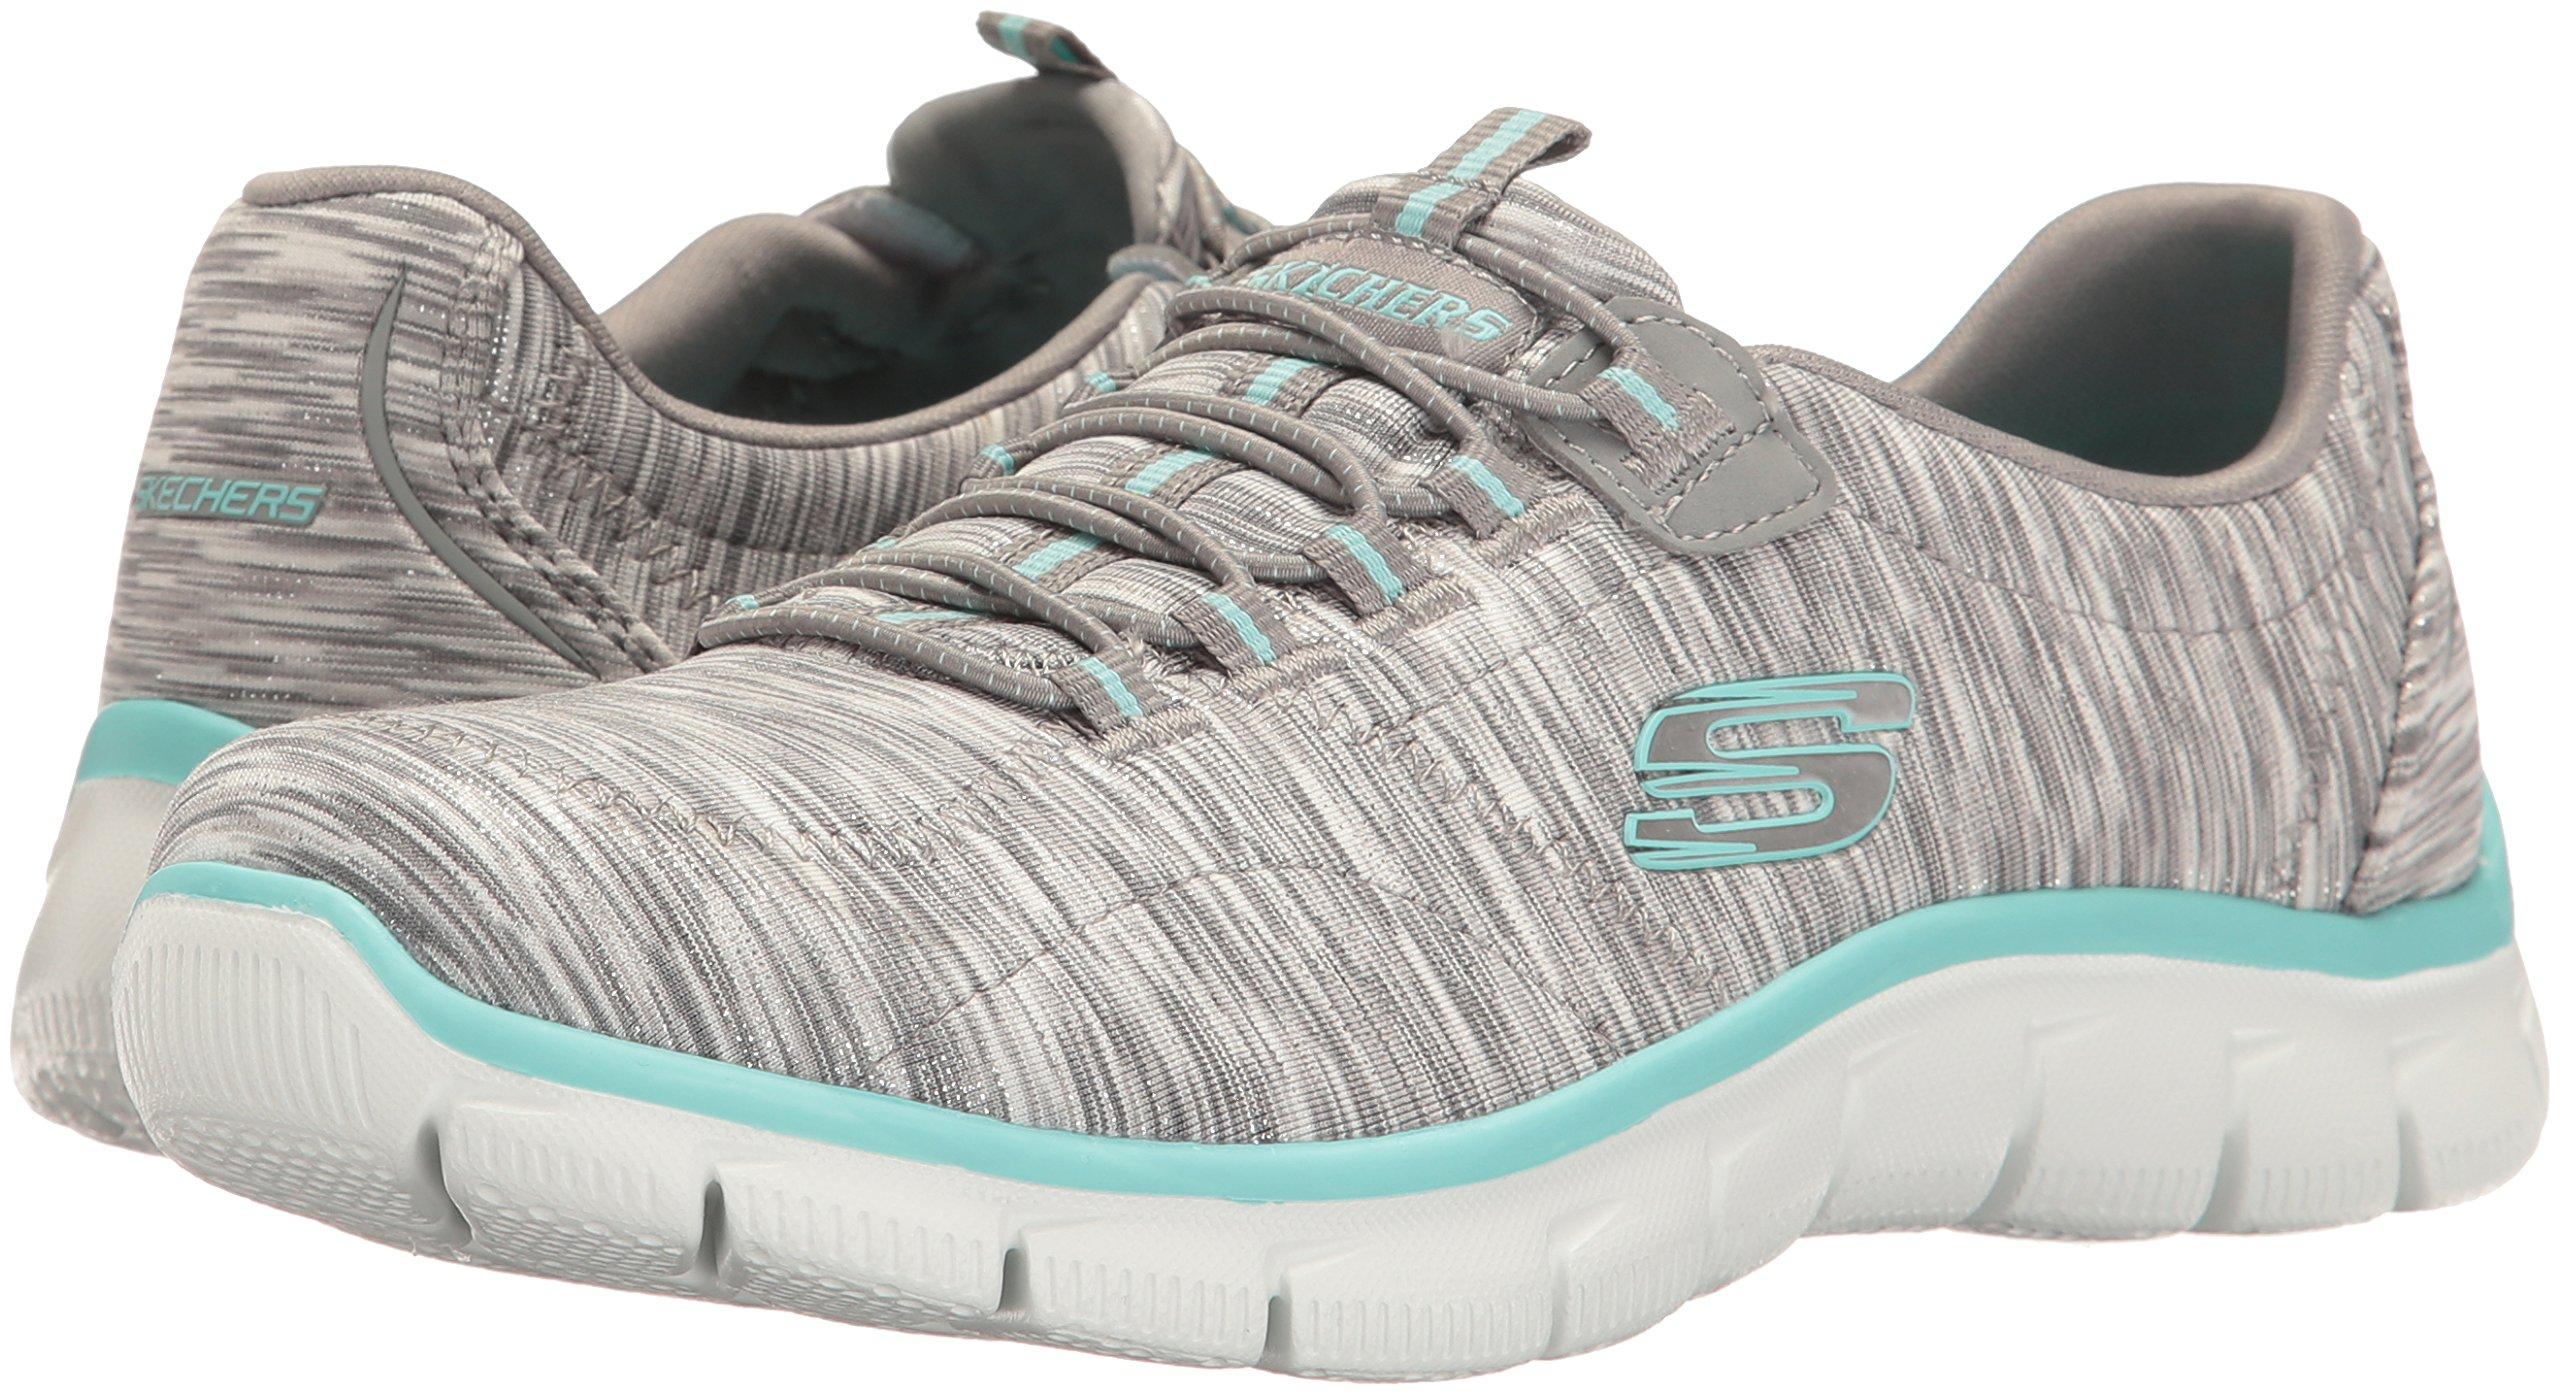 Skechers Women's Sport Empire - Rock Around Relaxed Fit Fashion Sneaker, Gray/Light Blue, 9 B(M) US by Skechers (Image #6)